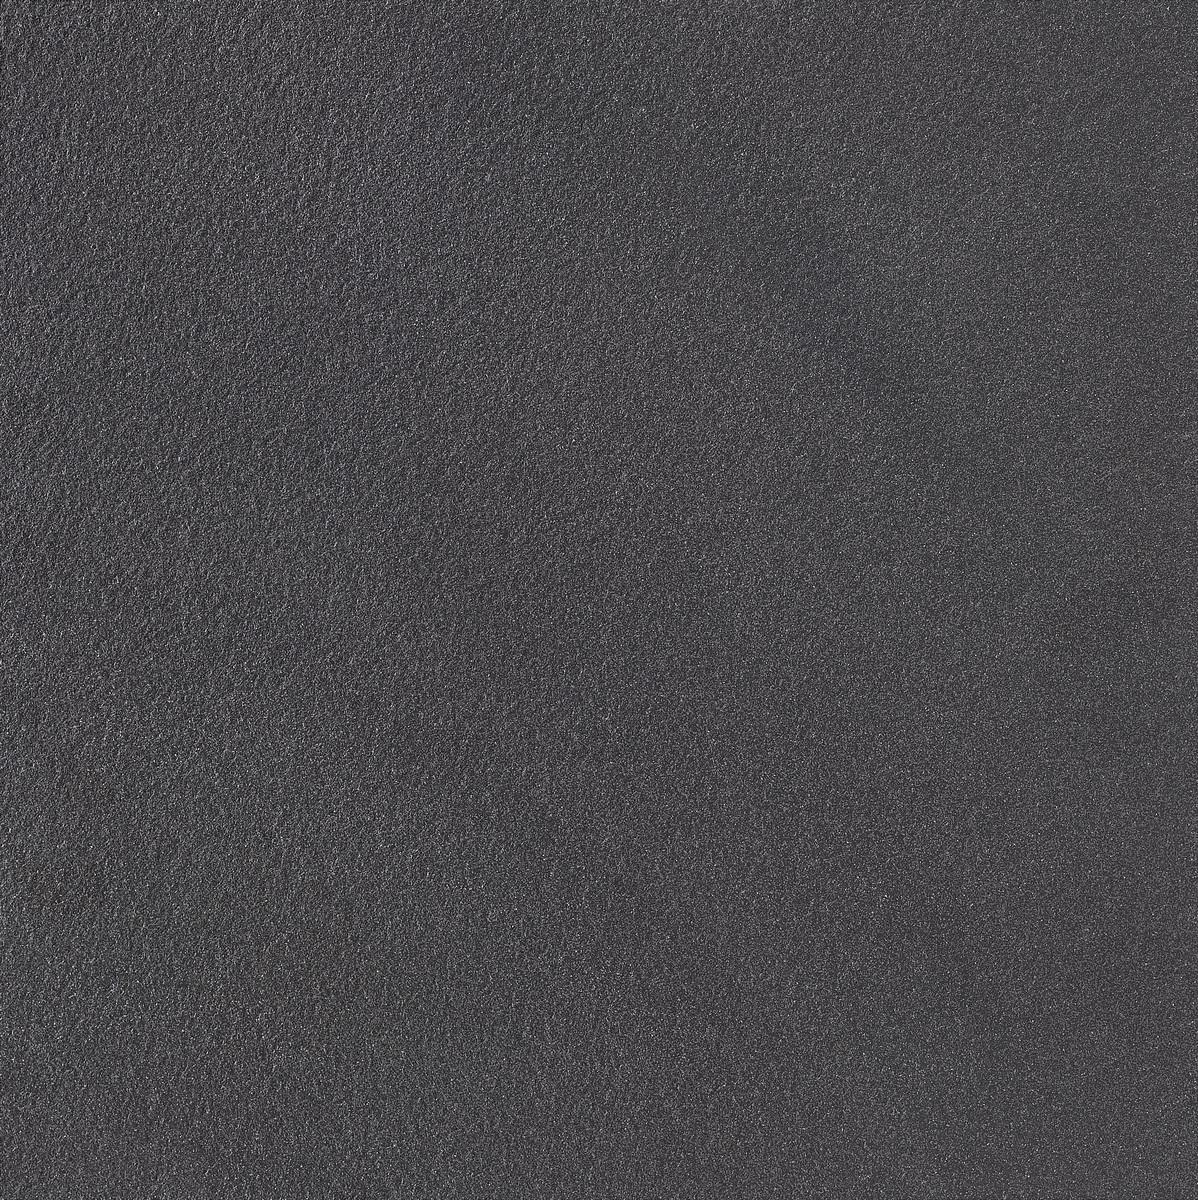 Tiles - PERTH - Textured Dark Grey 300x600mm (8 pieces)